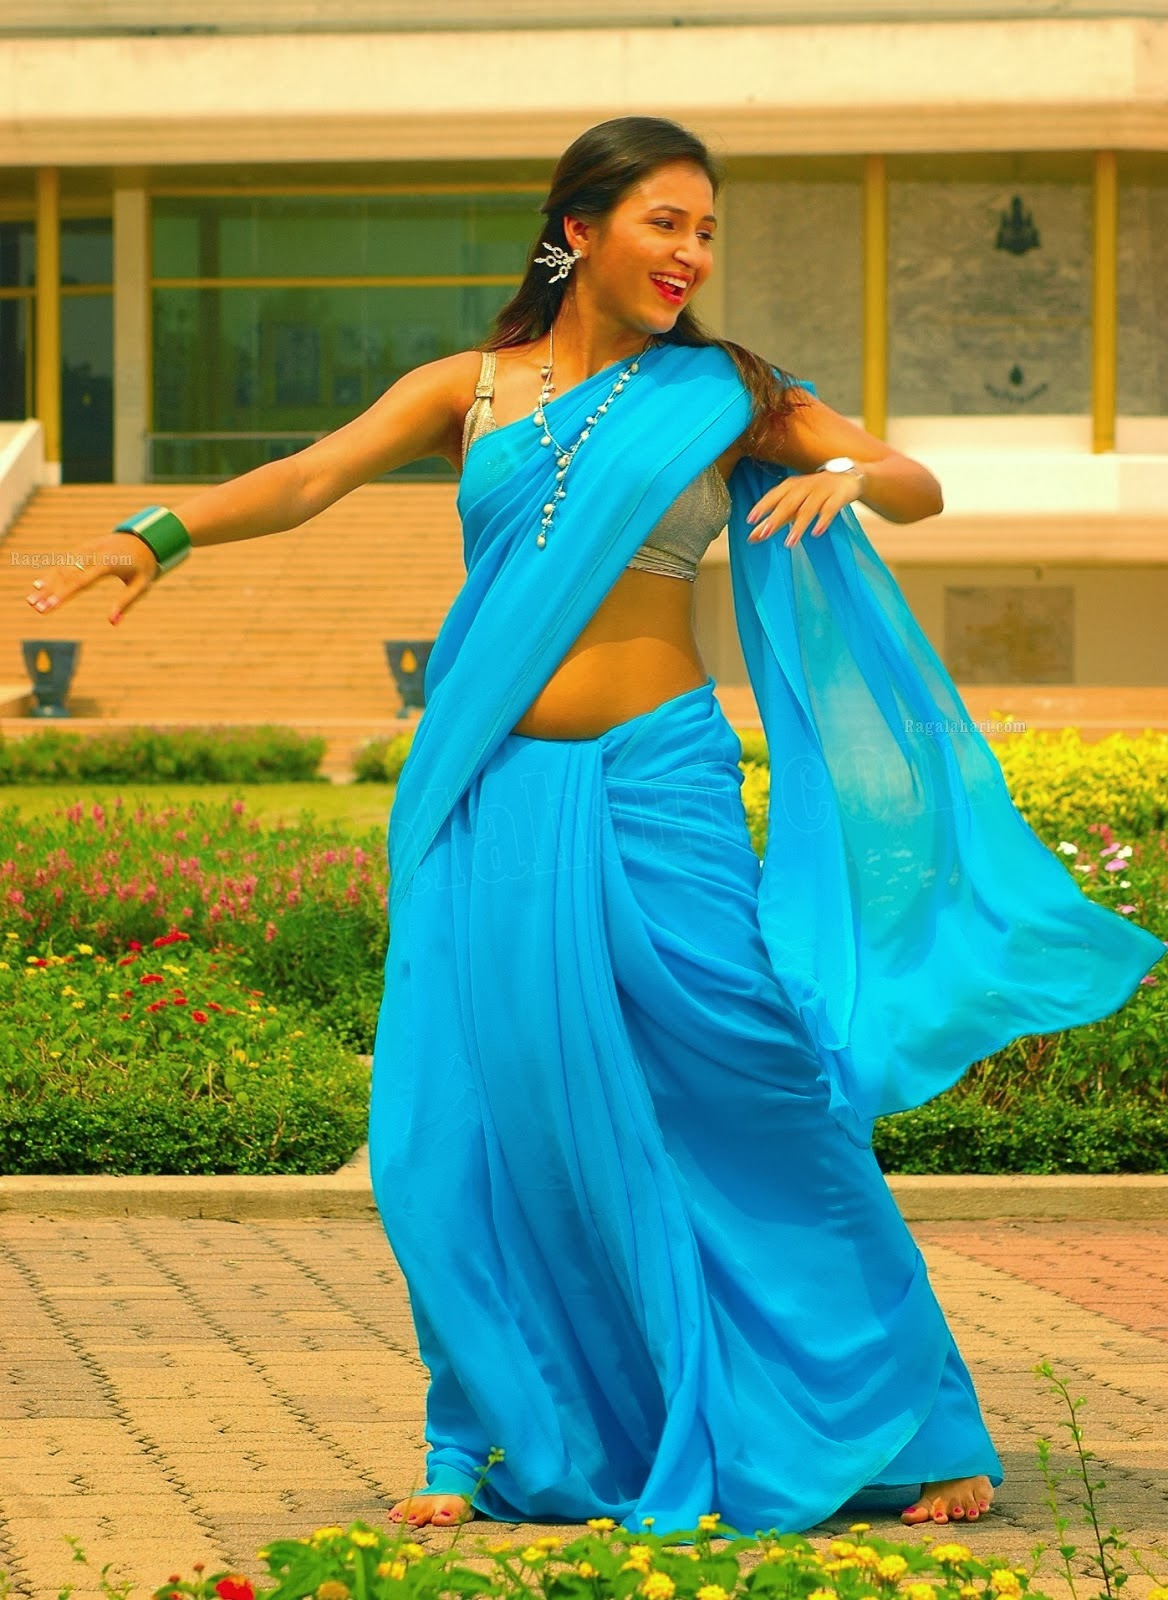 Hot Sarayu Spicy Saree Stills - CAP